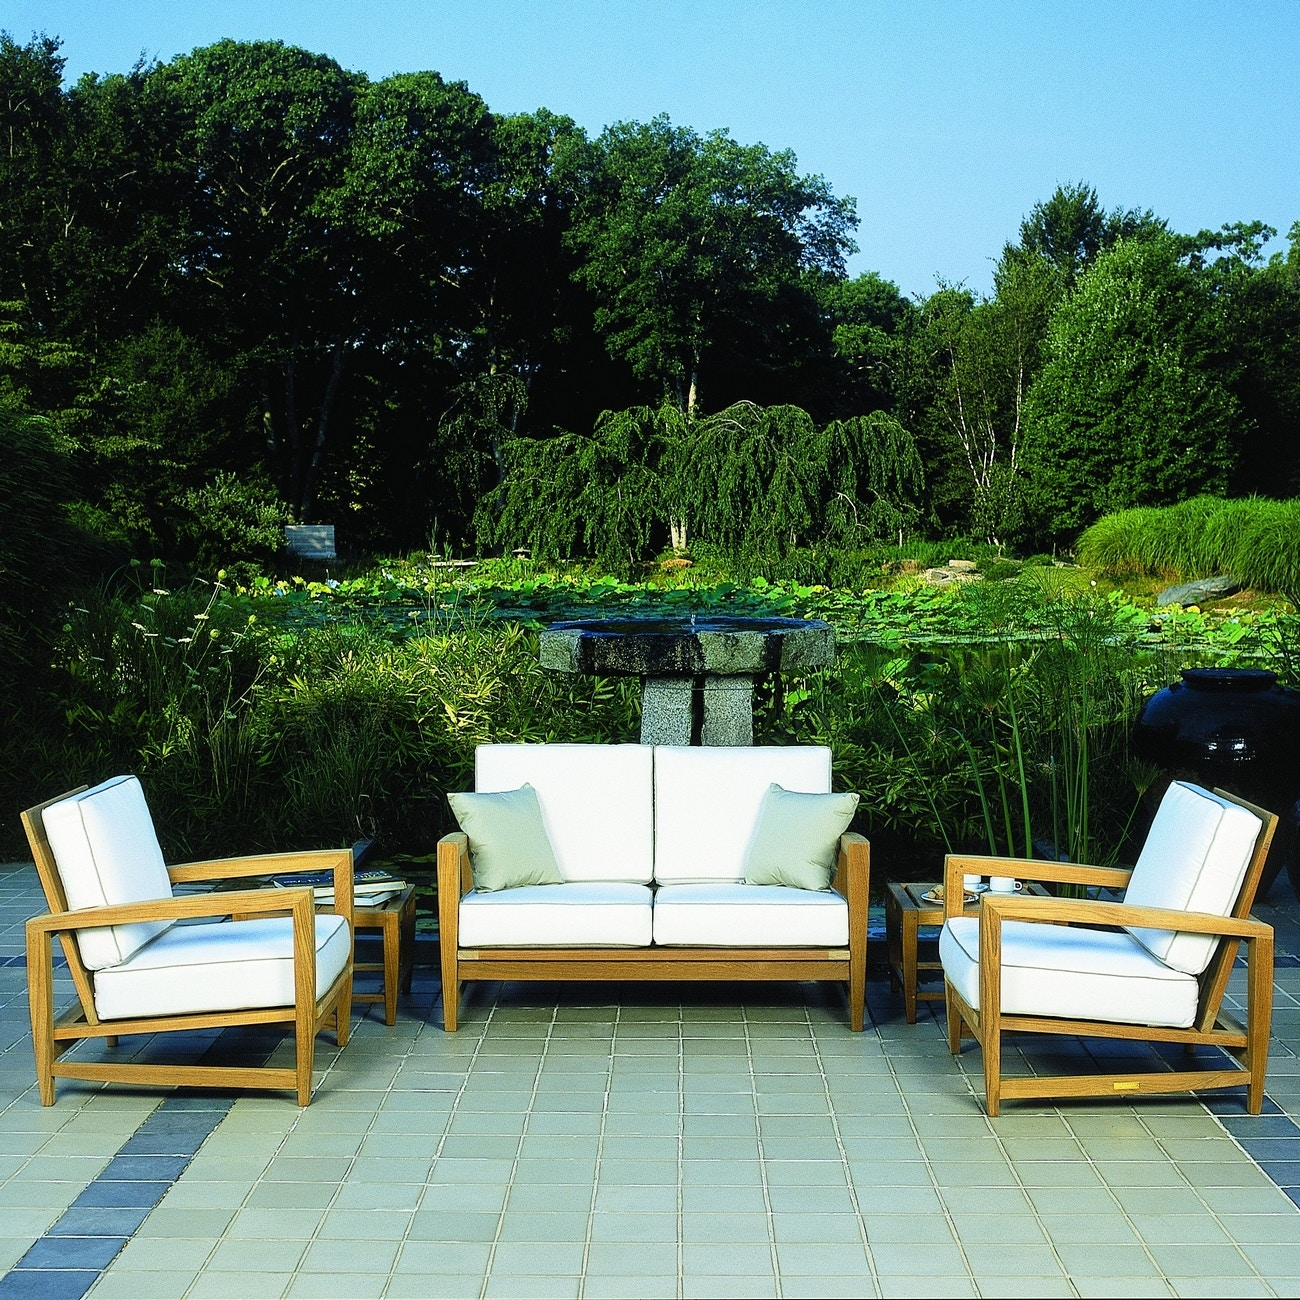 kingsley bate amalfi club chair cool outdoor chairs patio deep seating lounge am30 turner